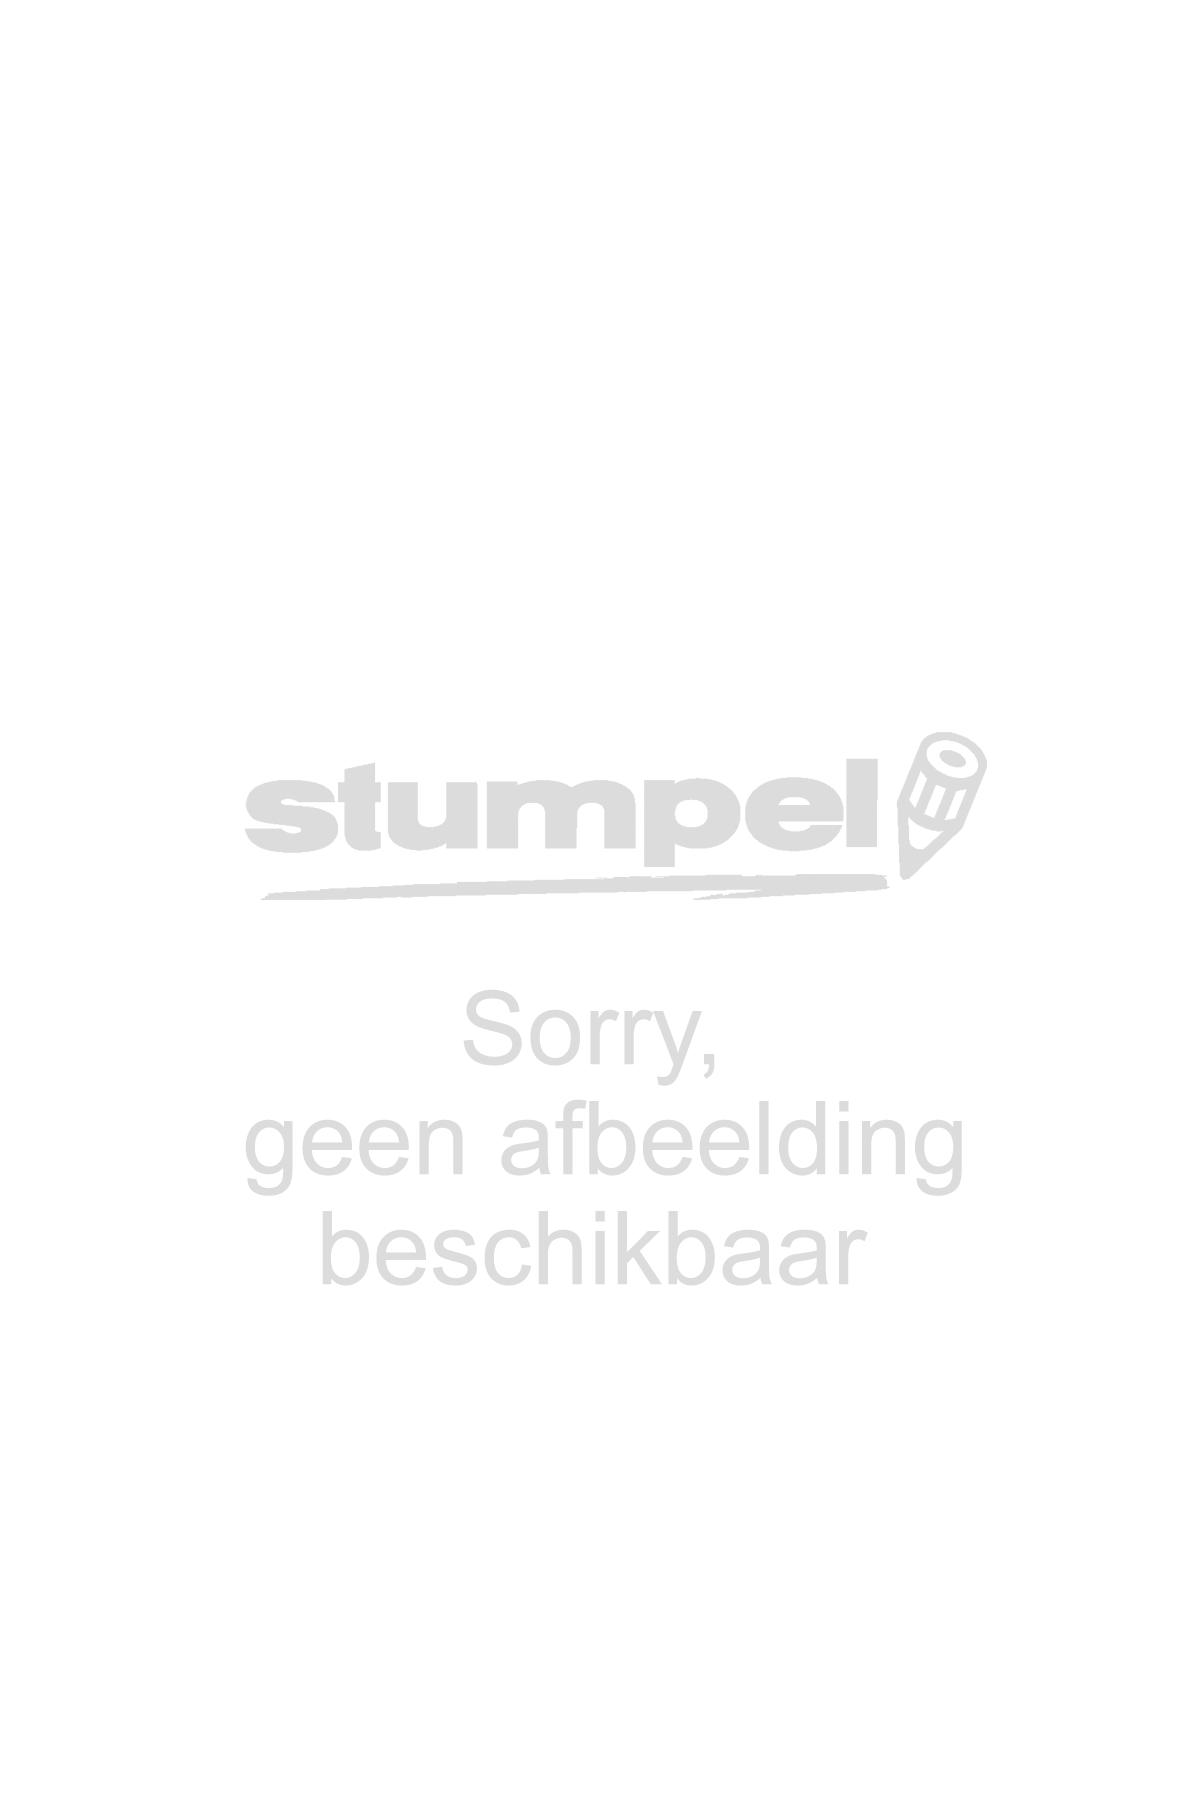 balpenvulling-schneider-jumbo-blauw-m-tbv-parker-625193